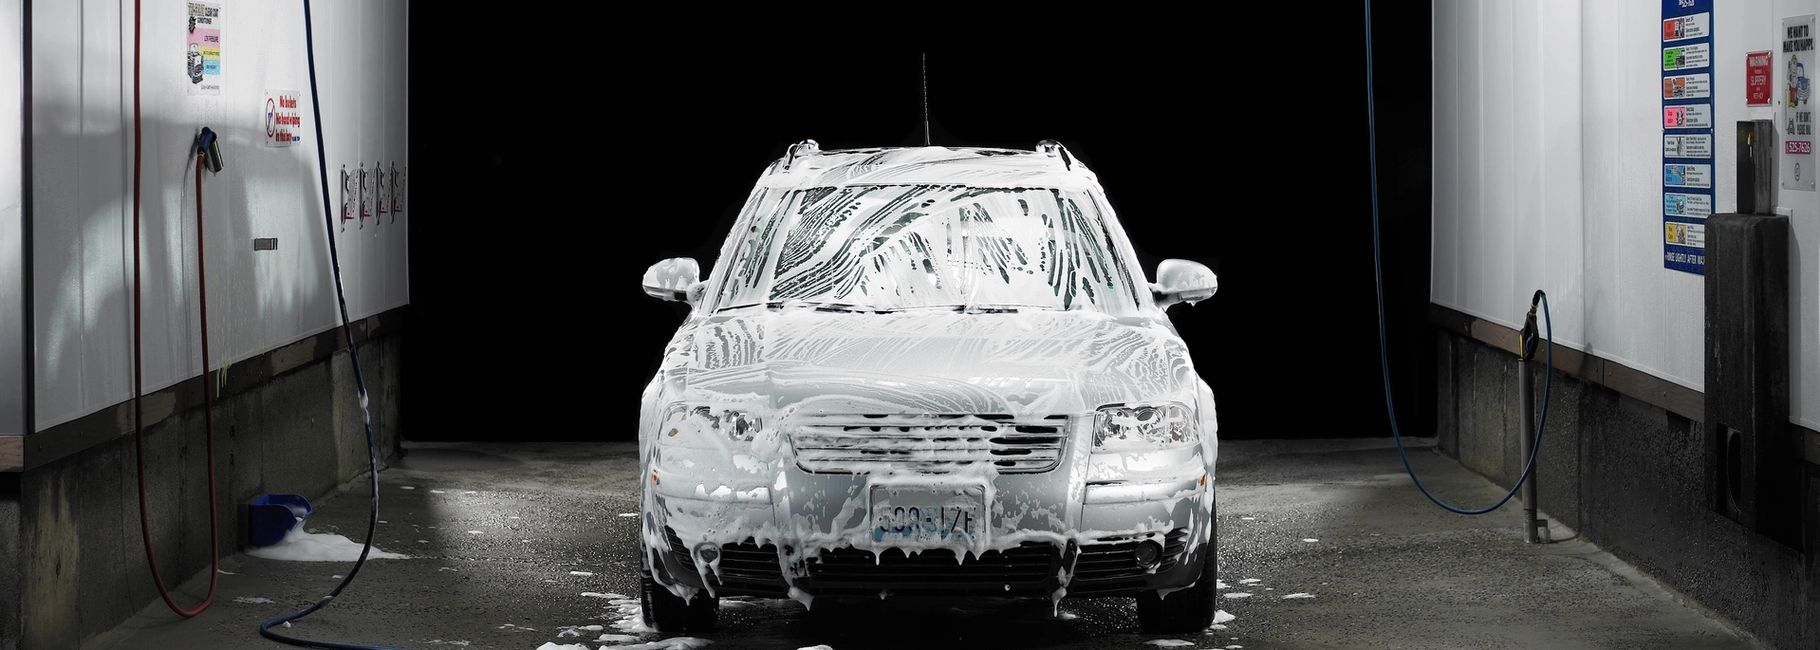 H h manufacturing distributing self serve car wash equipment car wash self serve equipment solutioingenieria Gallery